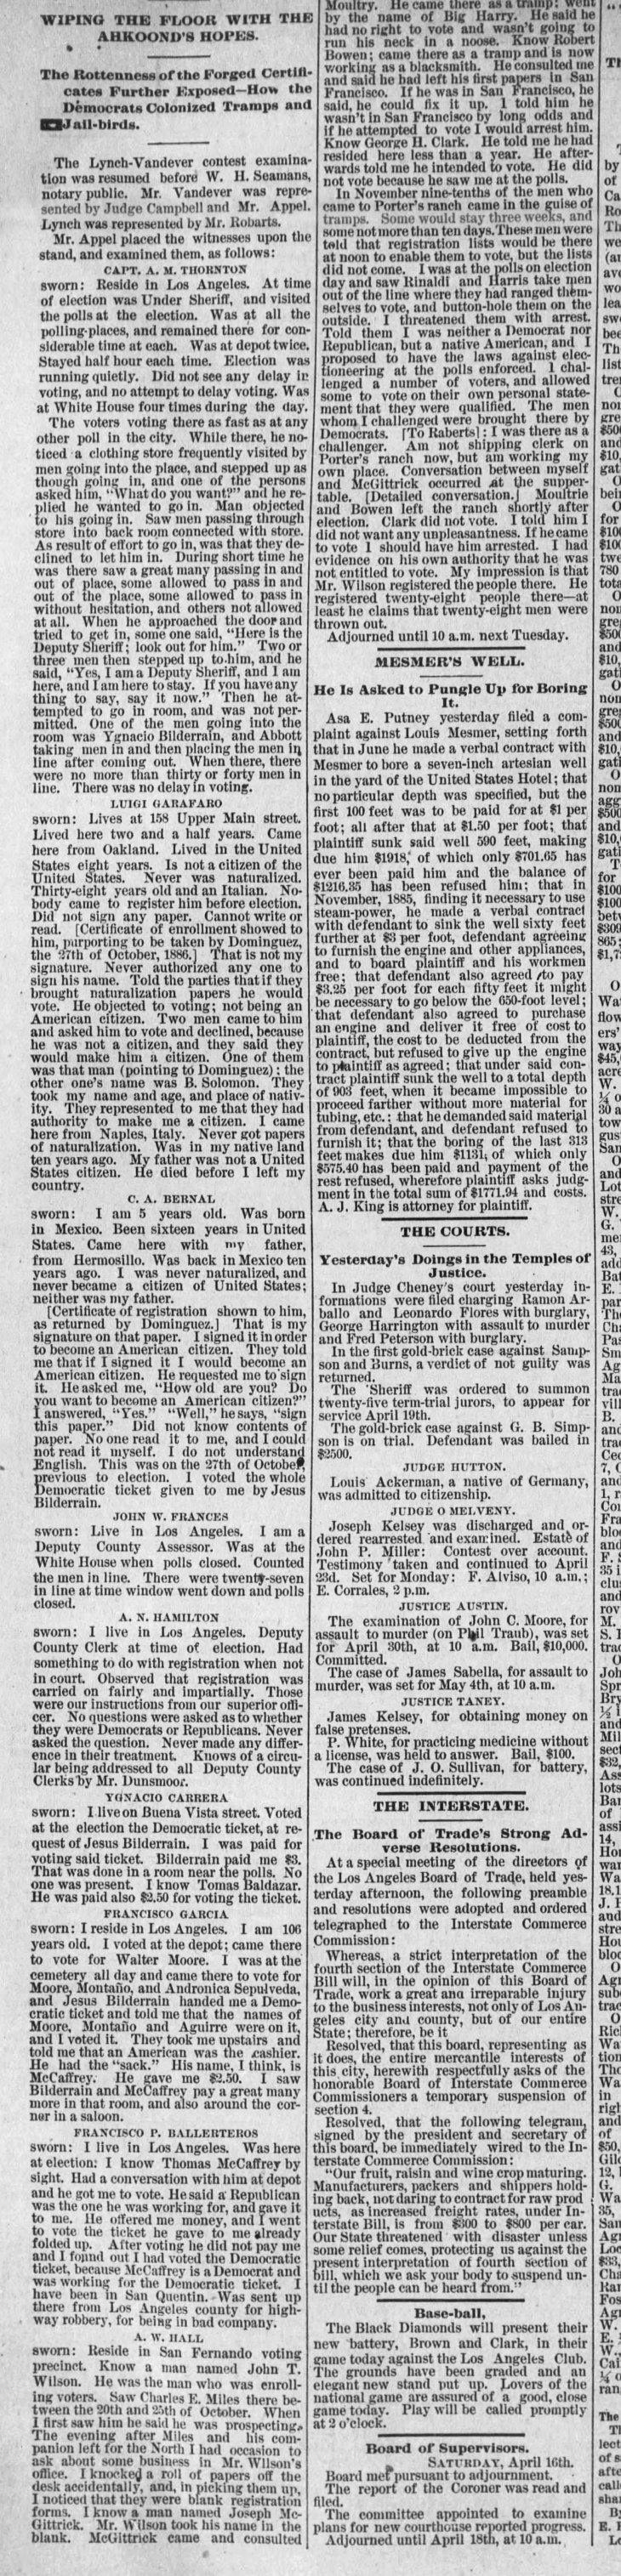 Jesus Bilderrain voter fraud The_Los_Angeles_Times_Sun__Apr_17__1887_